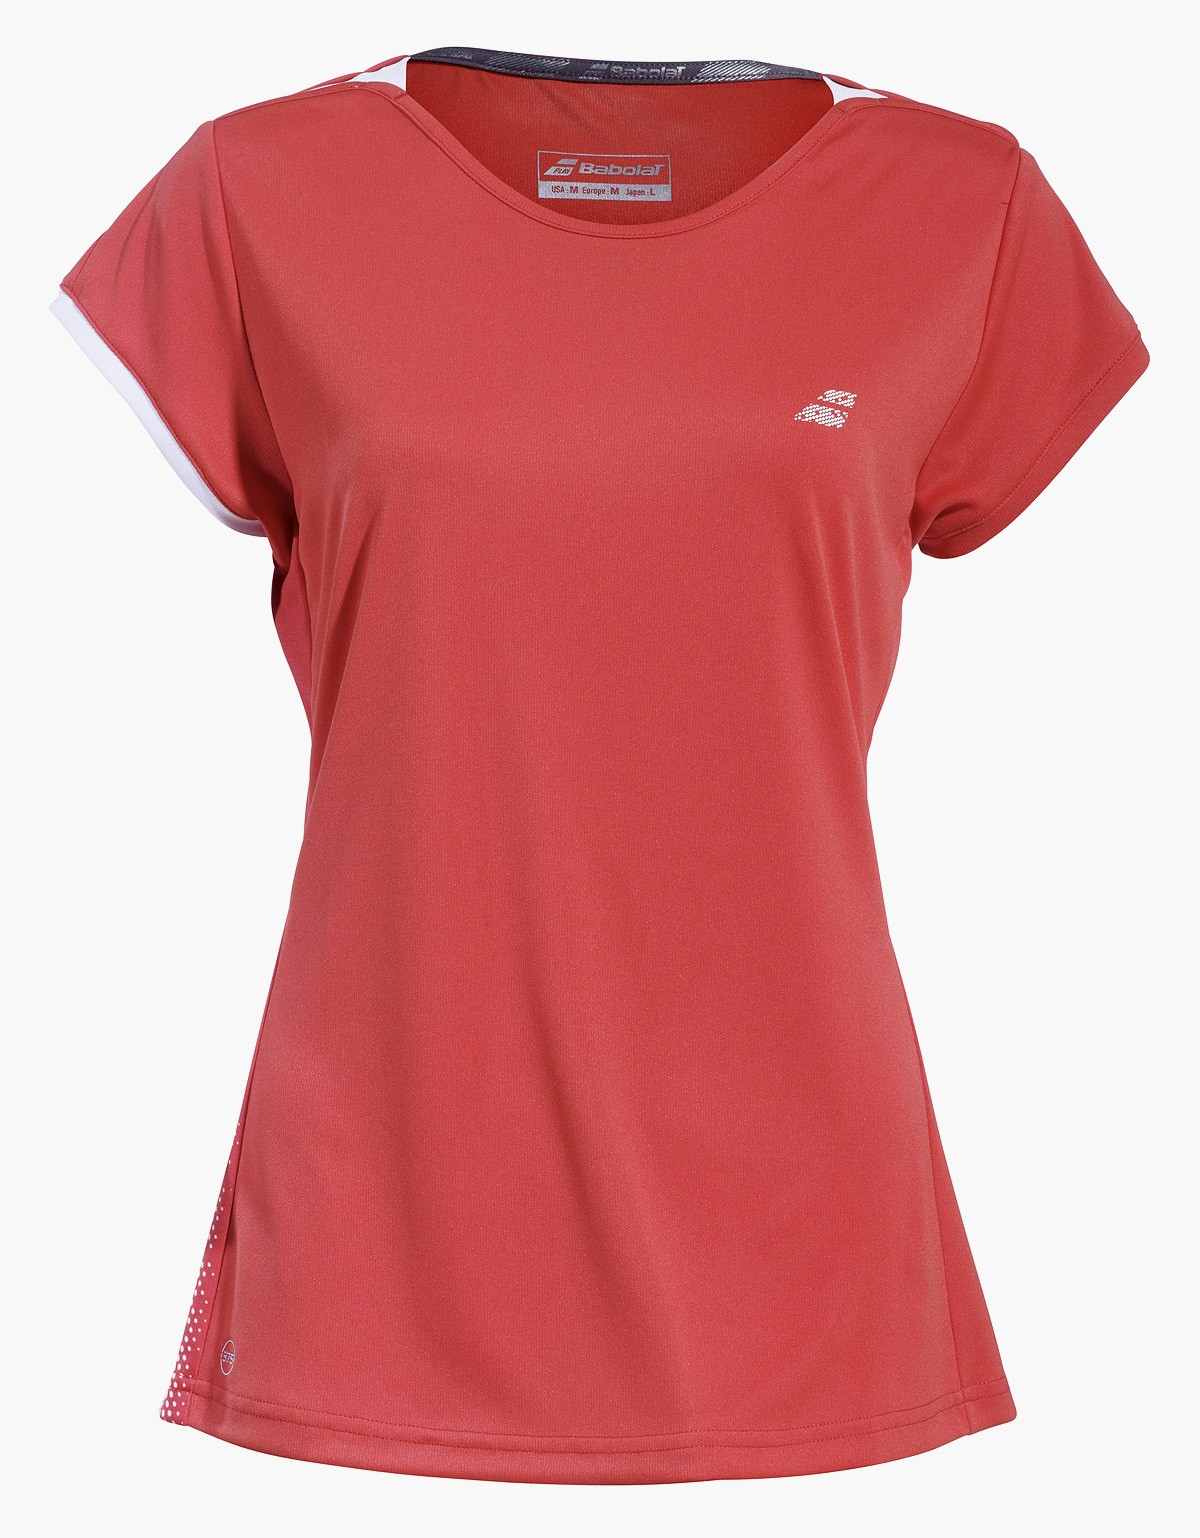 Koszulka tenisowa damska Babolat PERF Cap Sleeve Hibiscus -50%